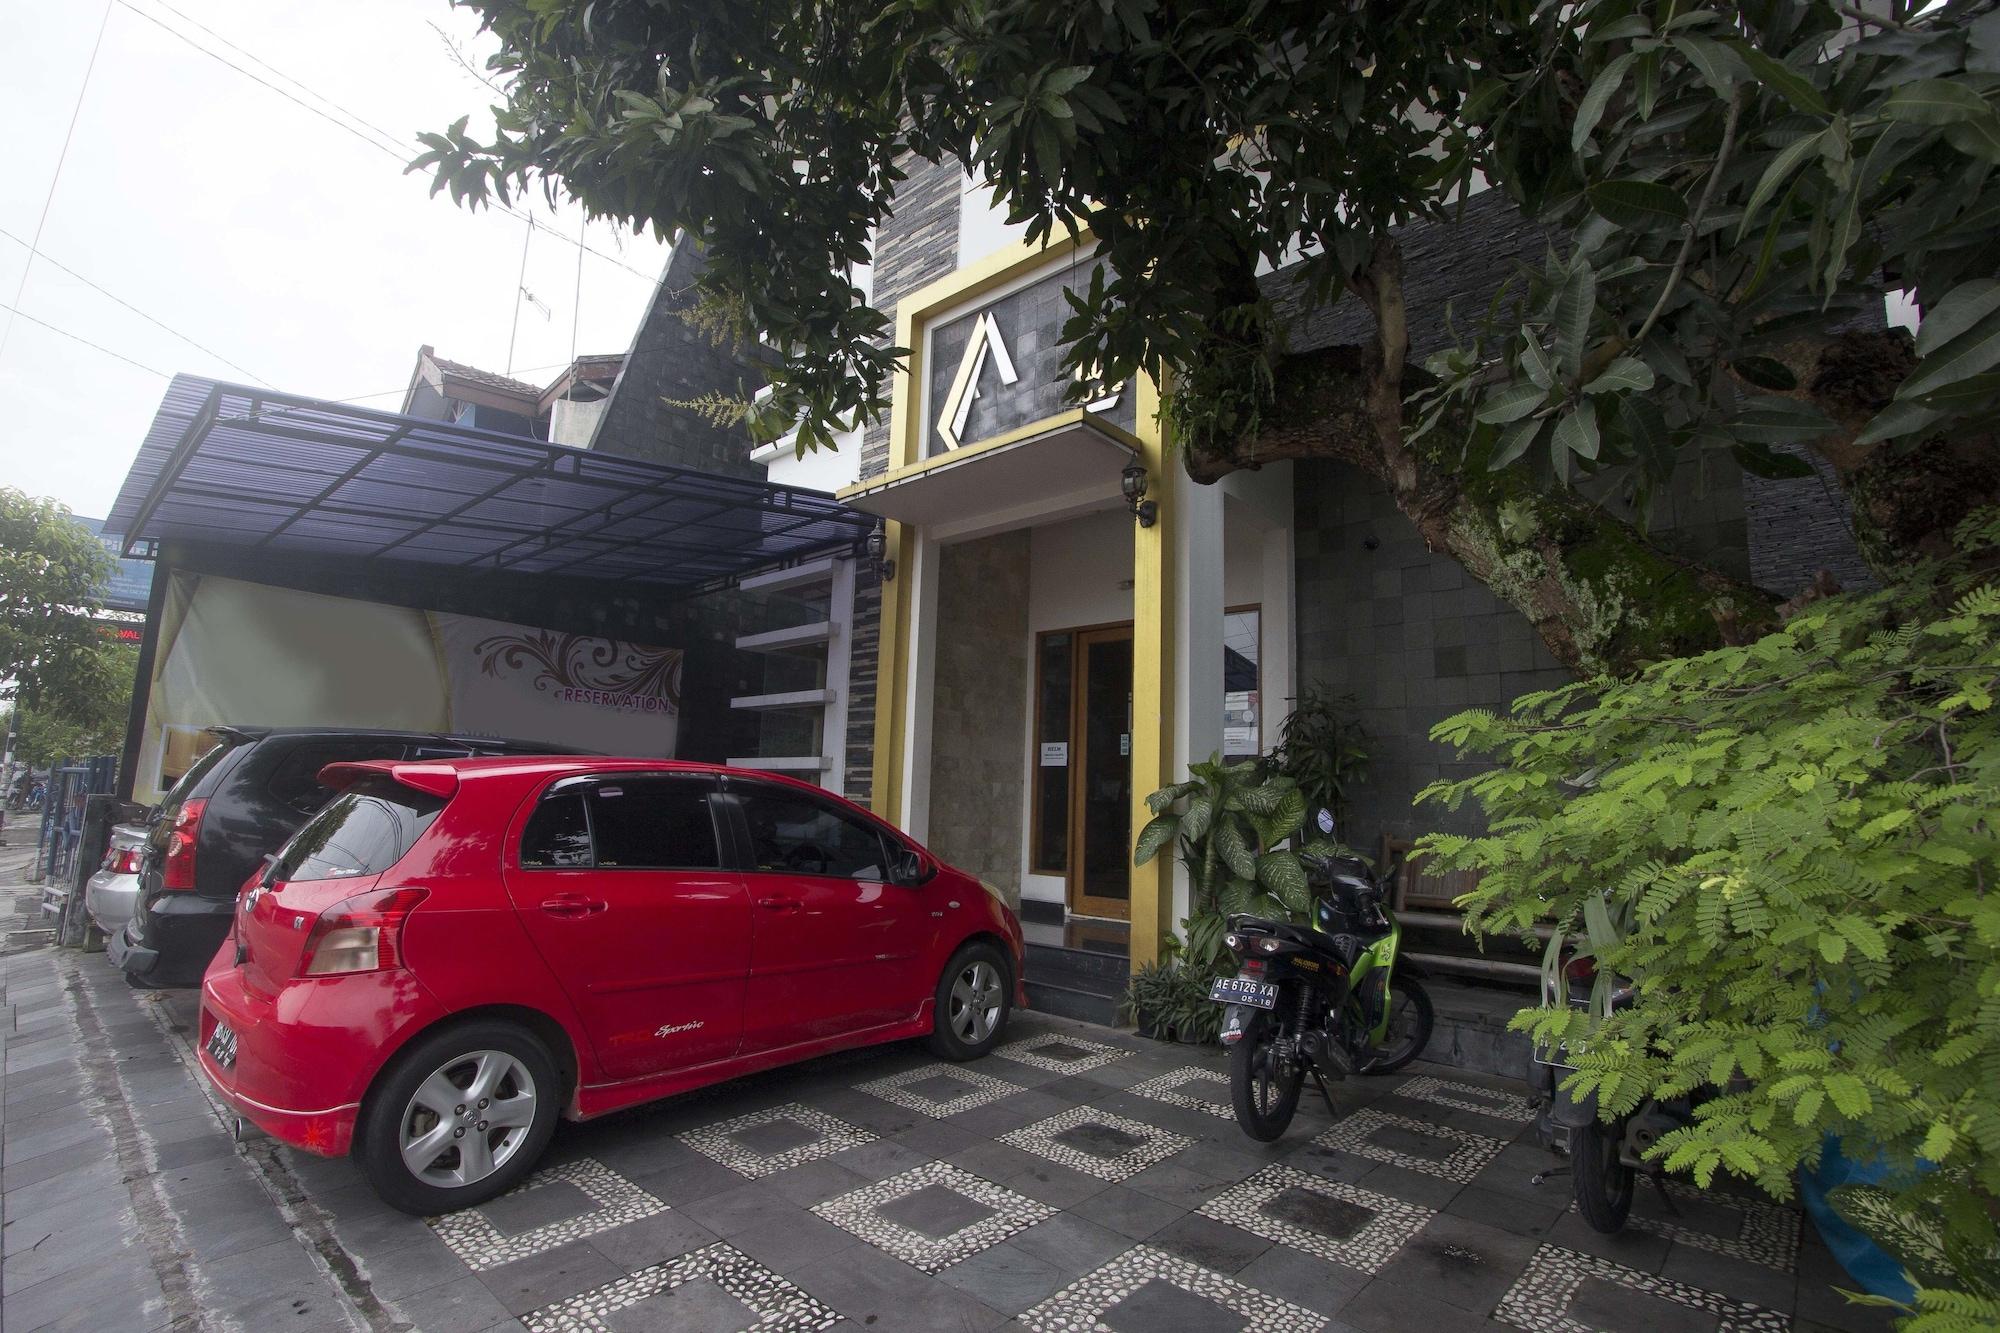 RedDoorz @ Bausasran, Yogyakarta